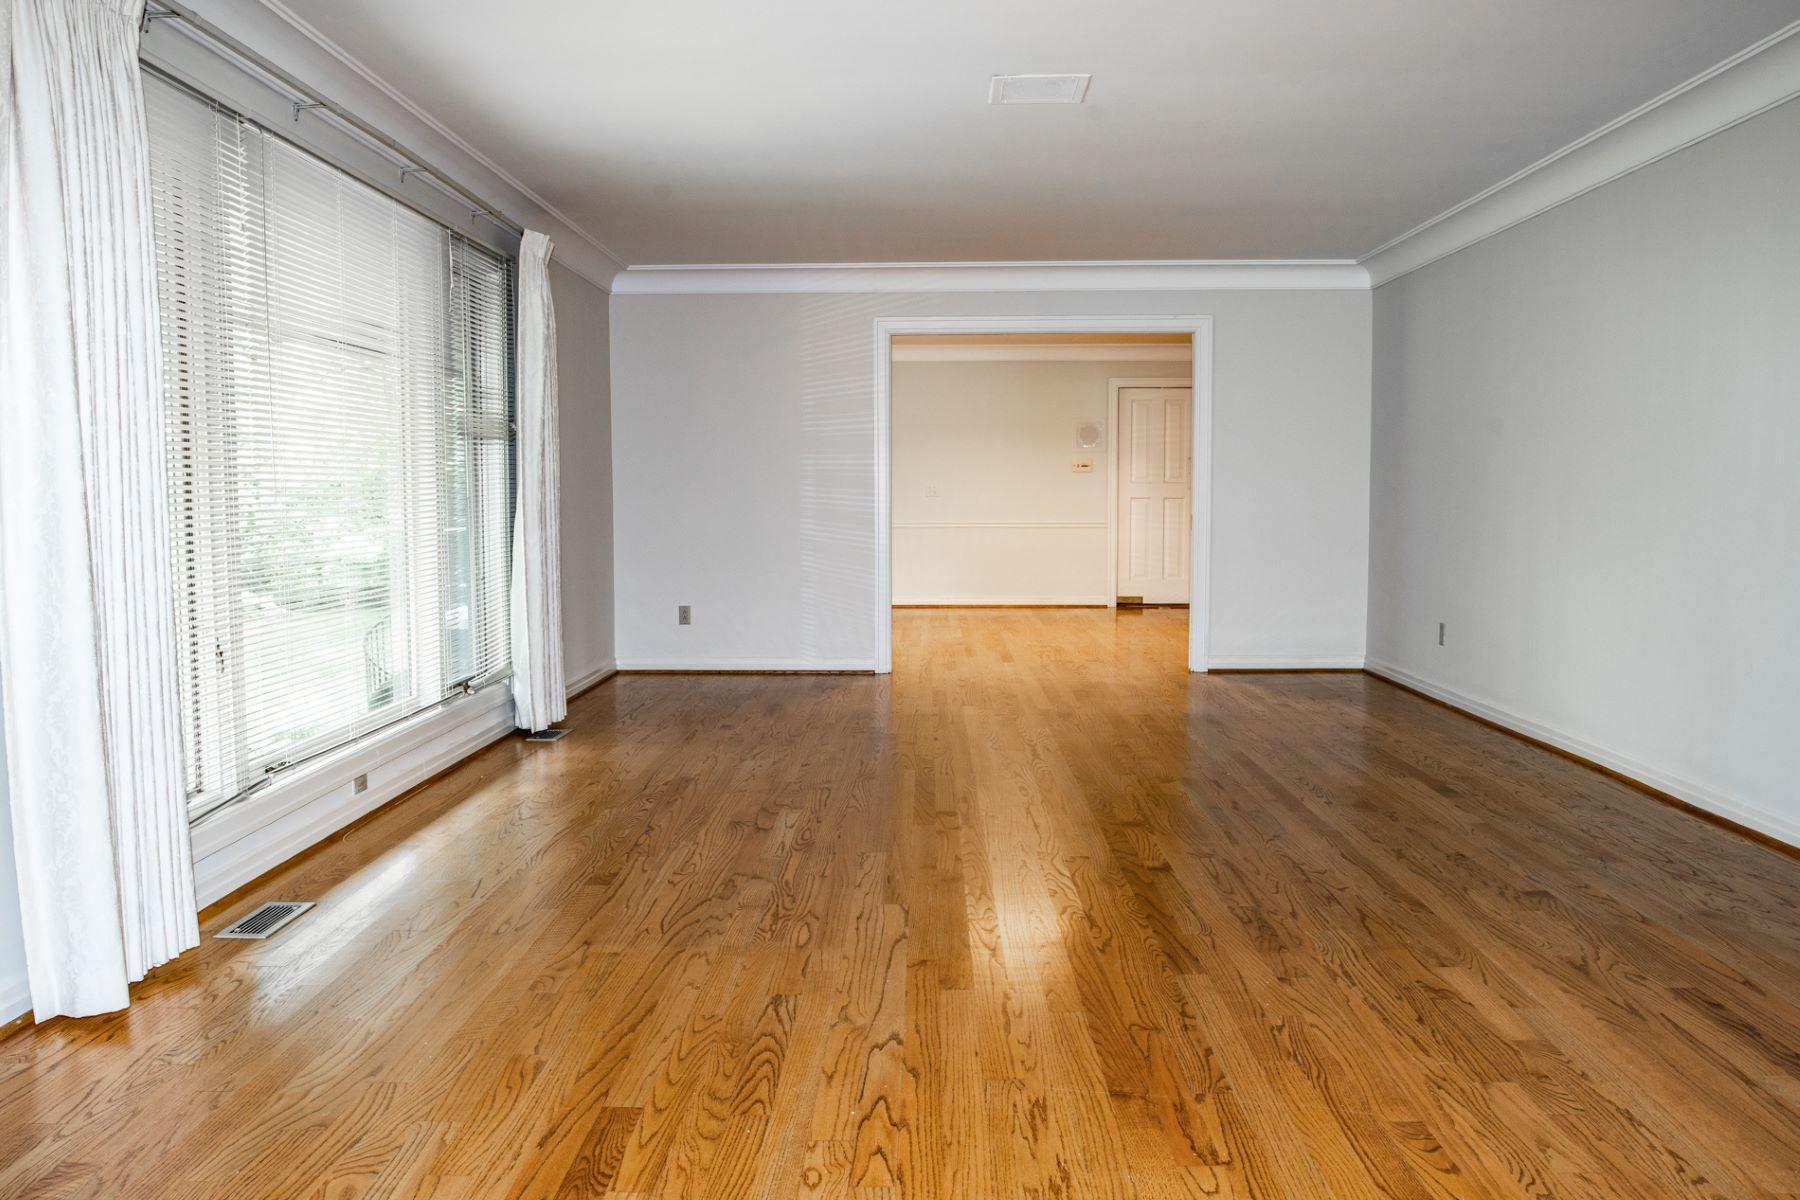 Additional photo for property listing at 10166 Winding Ridge Road Ladue, Missouri 63124 United States